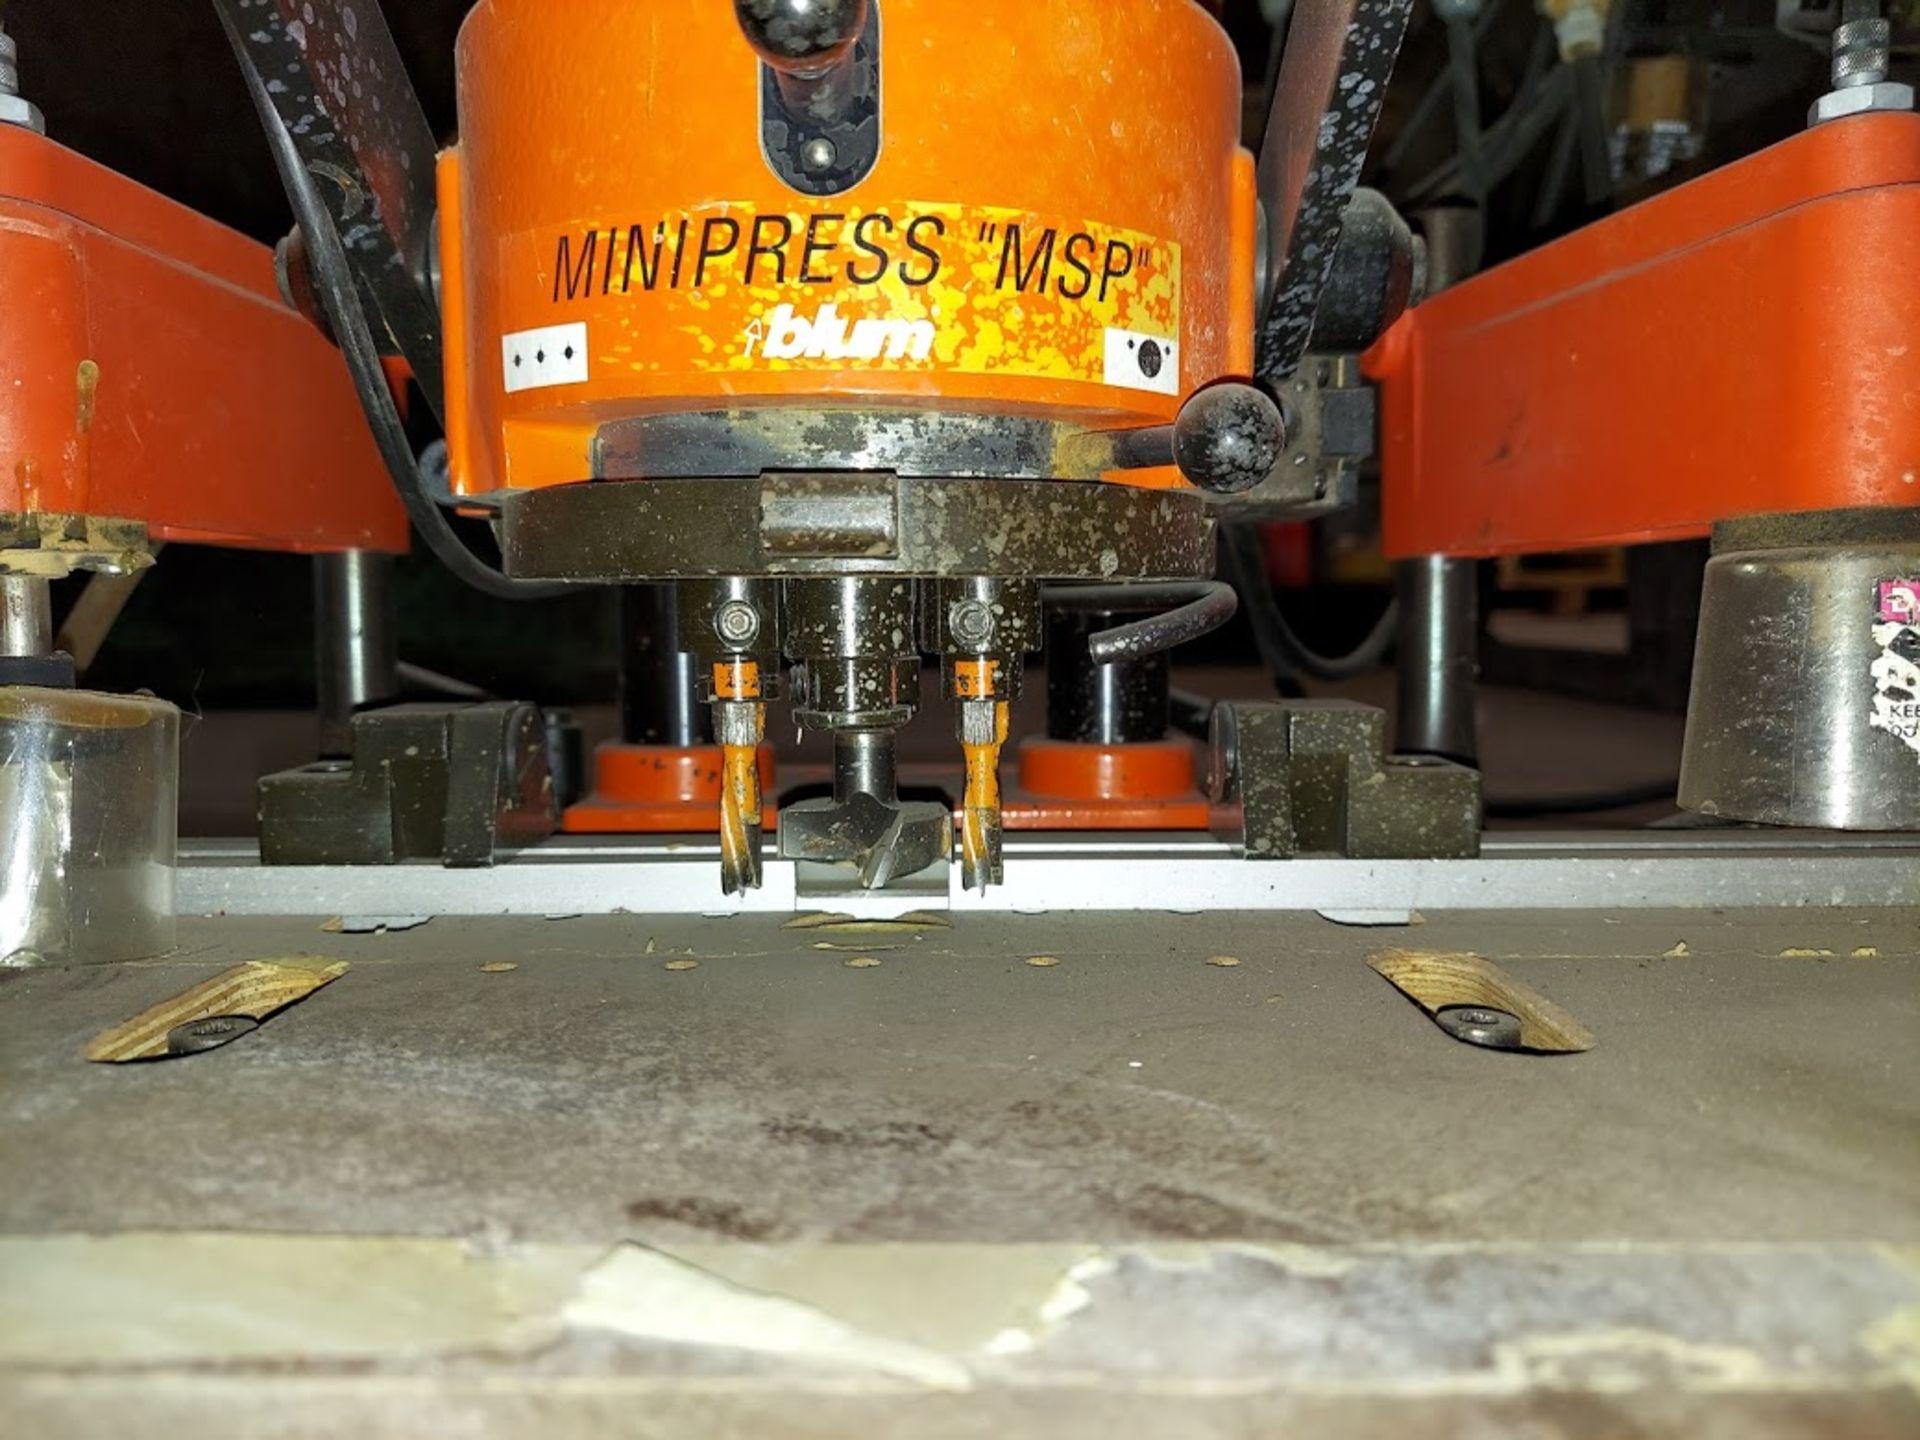 Blum Hinge Boring Machine, Ref #M51N1004 , 0.75 KW 230 Volts 3 Phase - Image 4 of 4